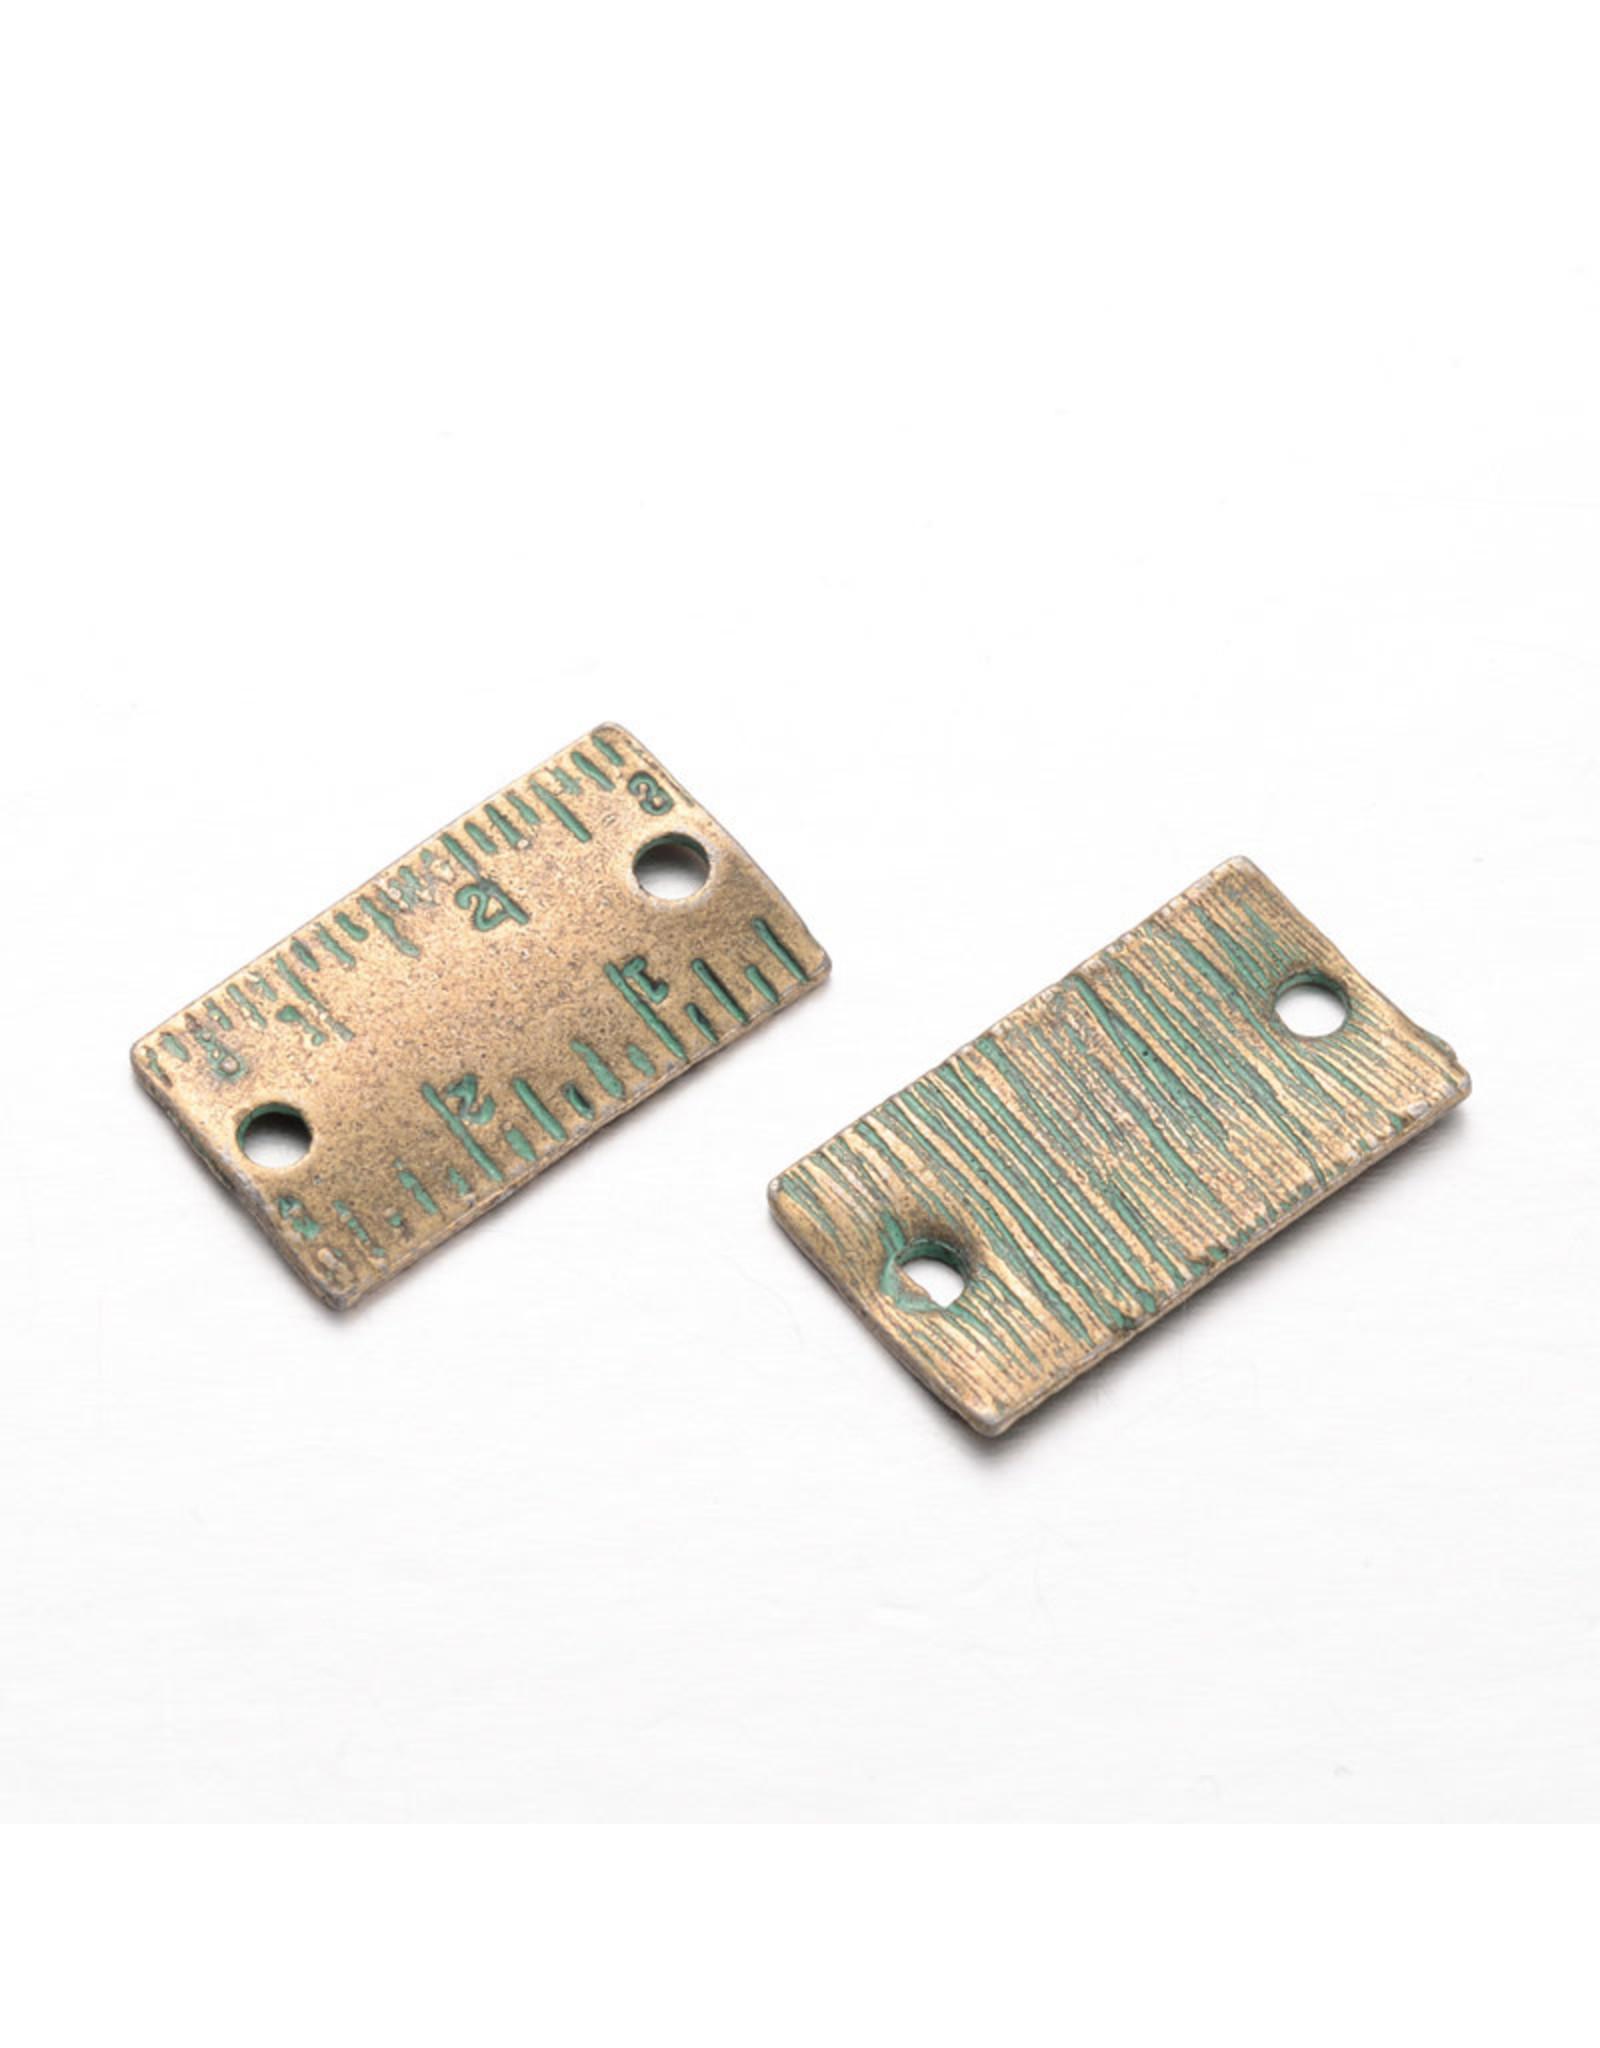 Ruler Link (1to1) 12x21mm Verdigris Green  x5  NF